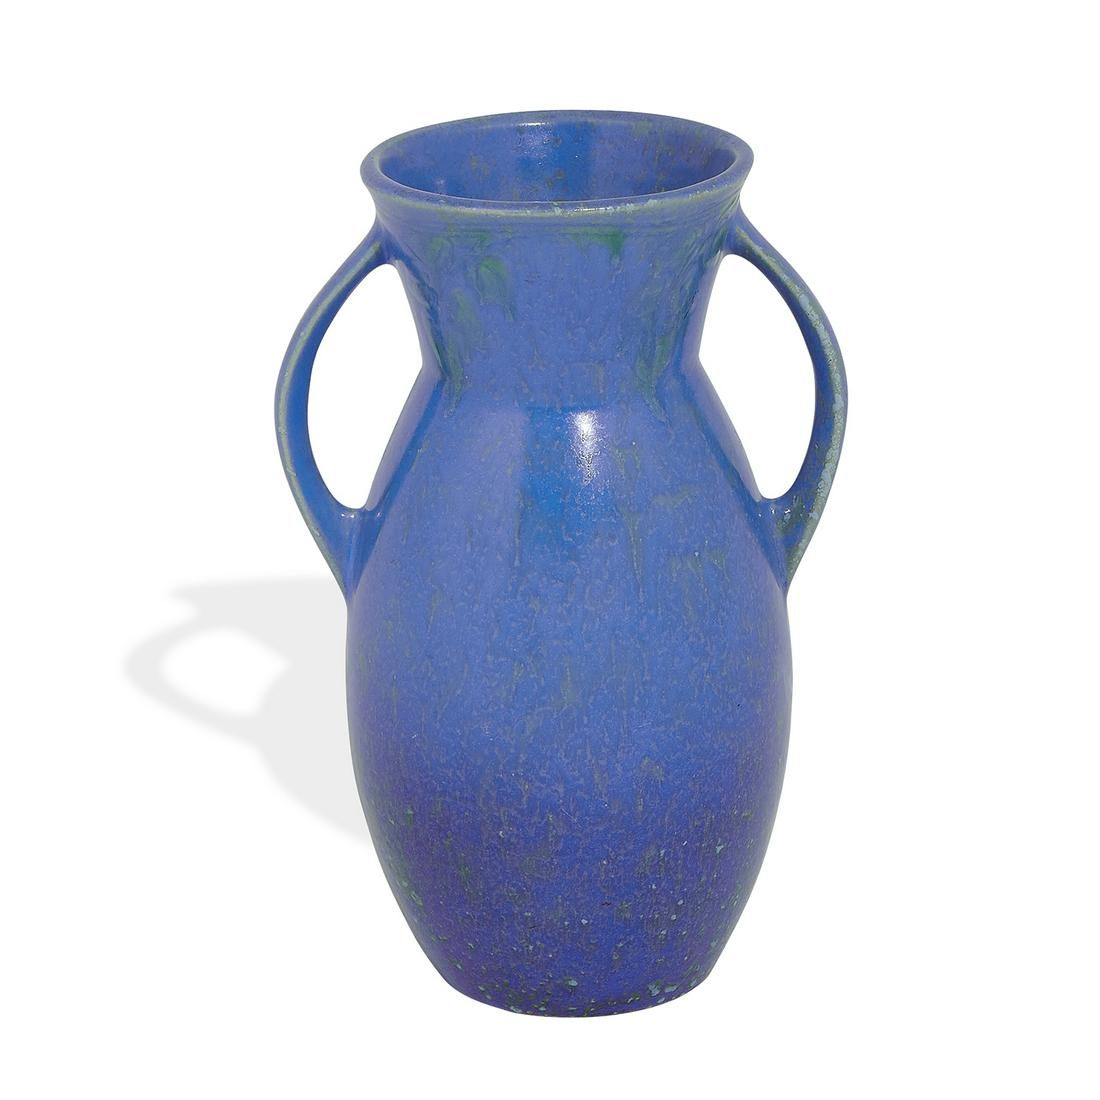 Roseville Pottery Co. Windsor two-handled vase